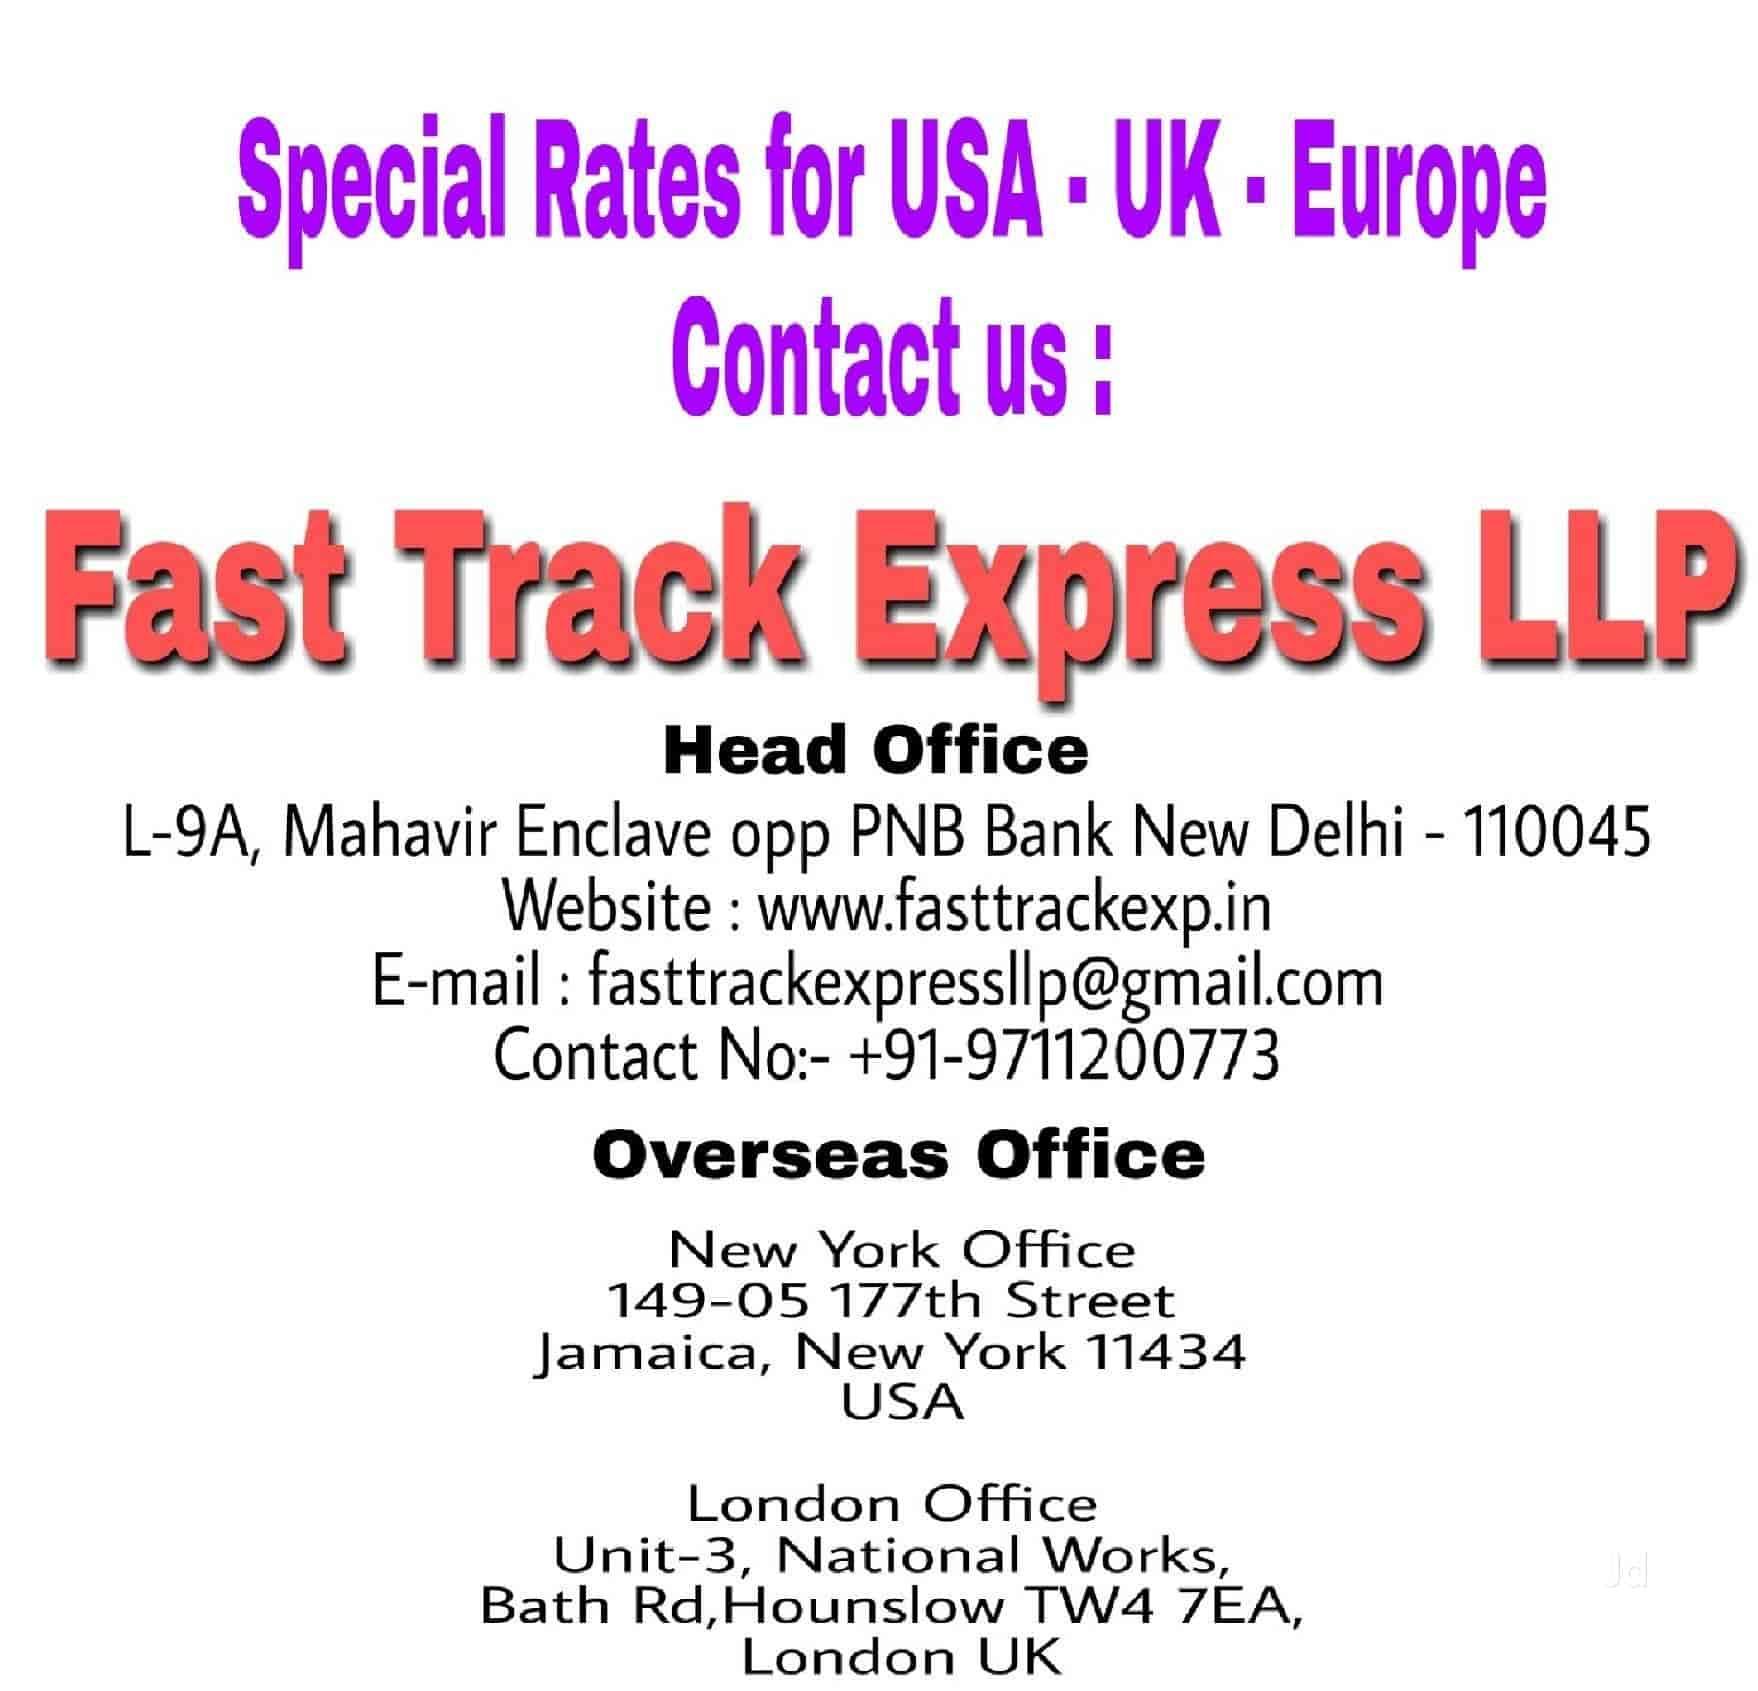 Fast Track Express Llp, Mahavir Enclave - International